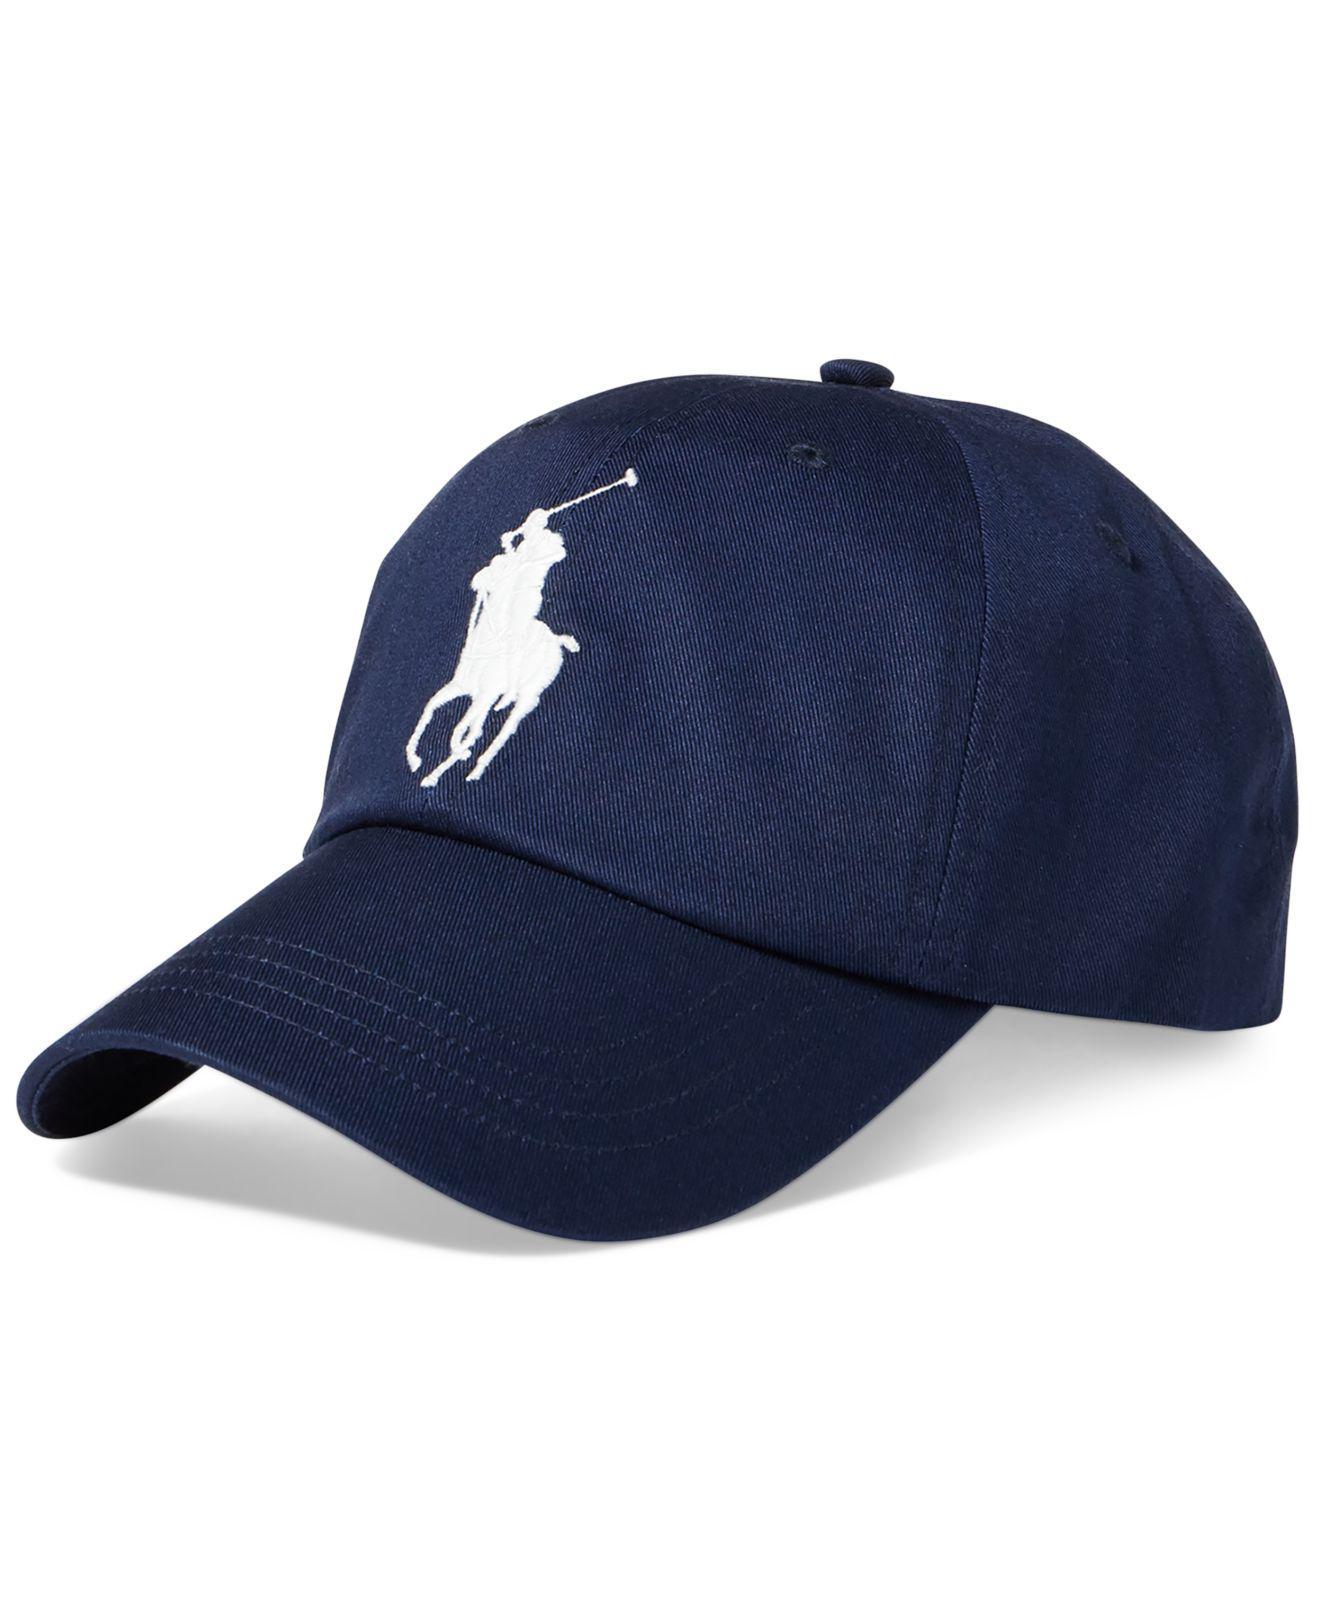 b1bf5fbf8a318 Lyst - Polo Ralph Lauren Men s Chino Sports Cap in Blue for Men ...